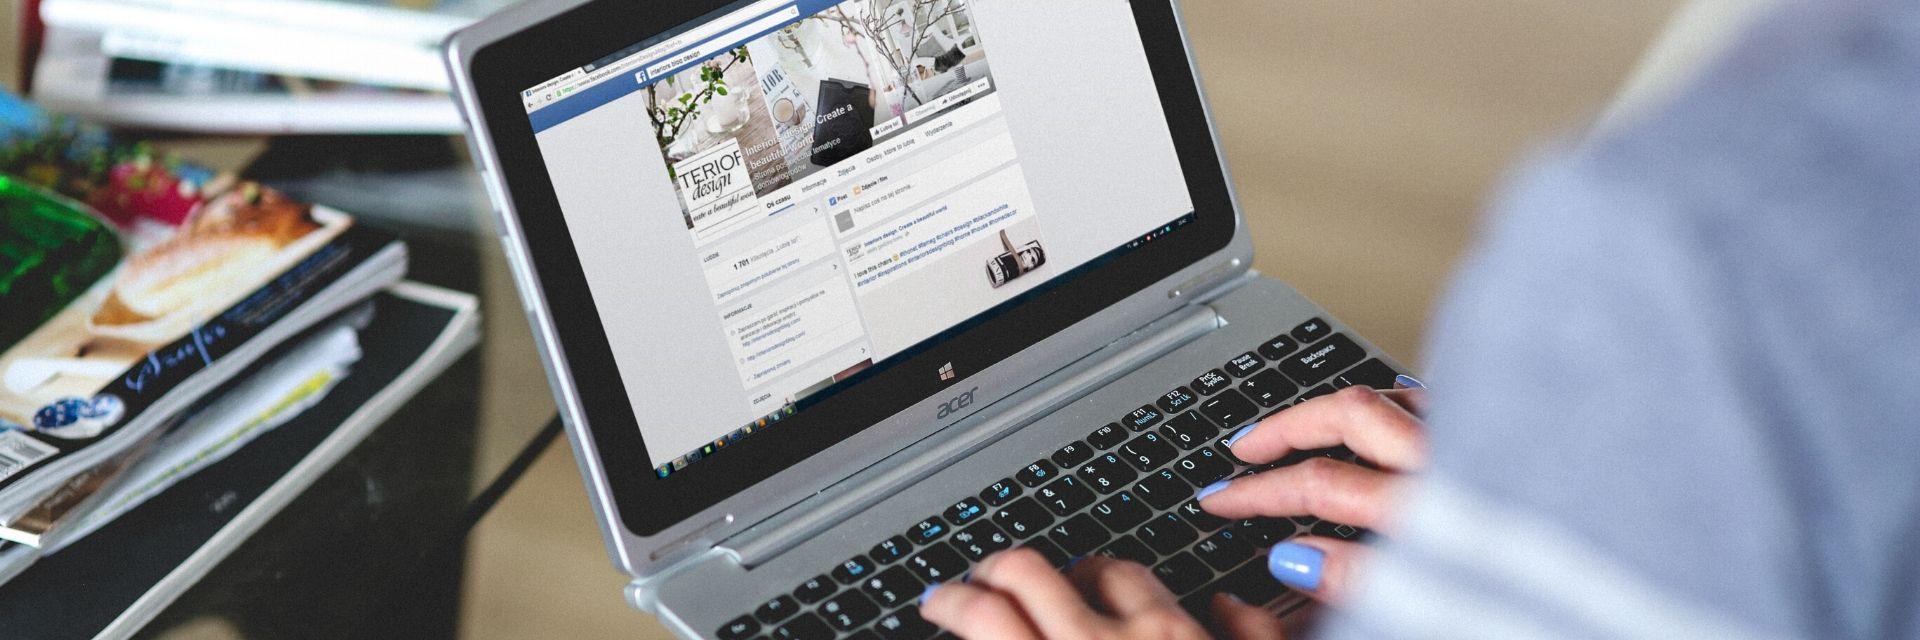 Social Media kann dem Ruf der Pflege schaden